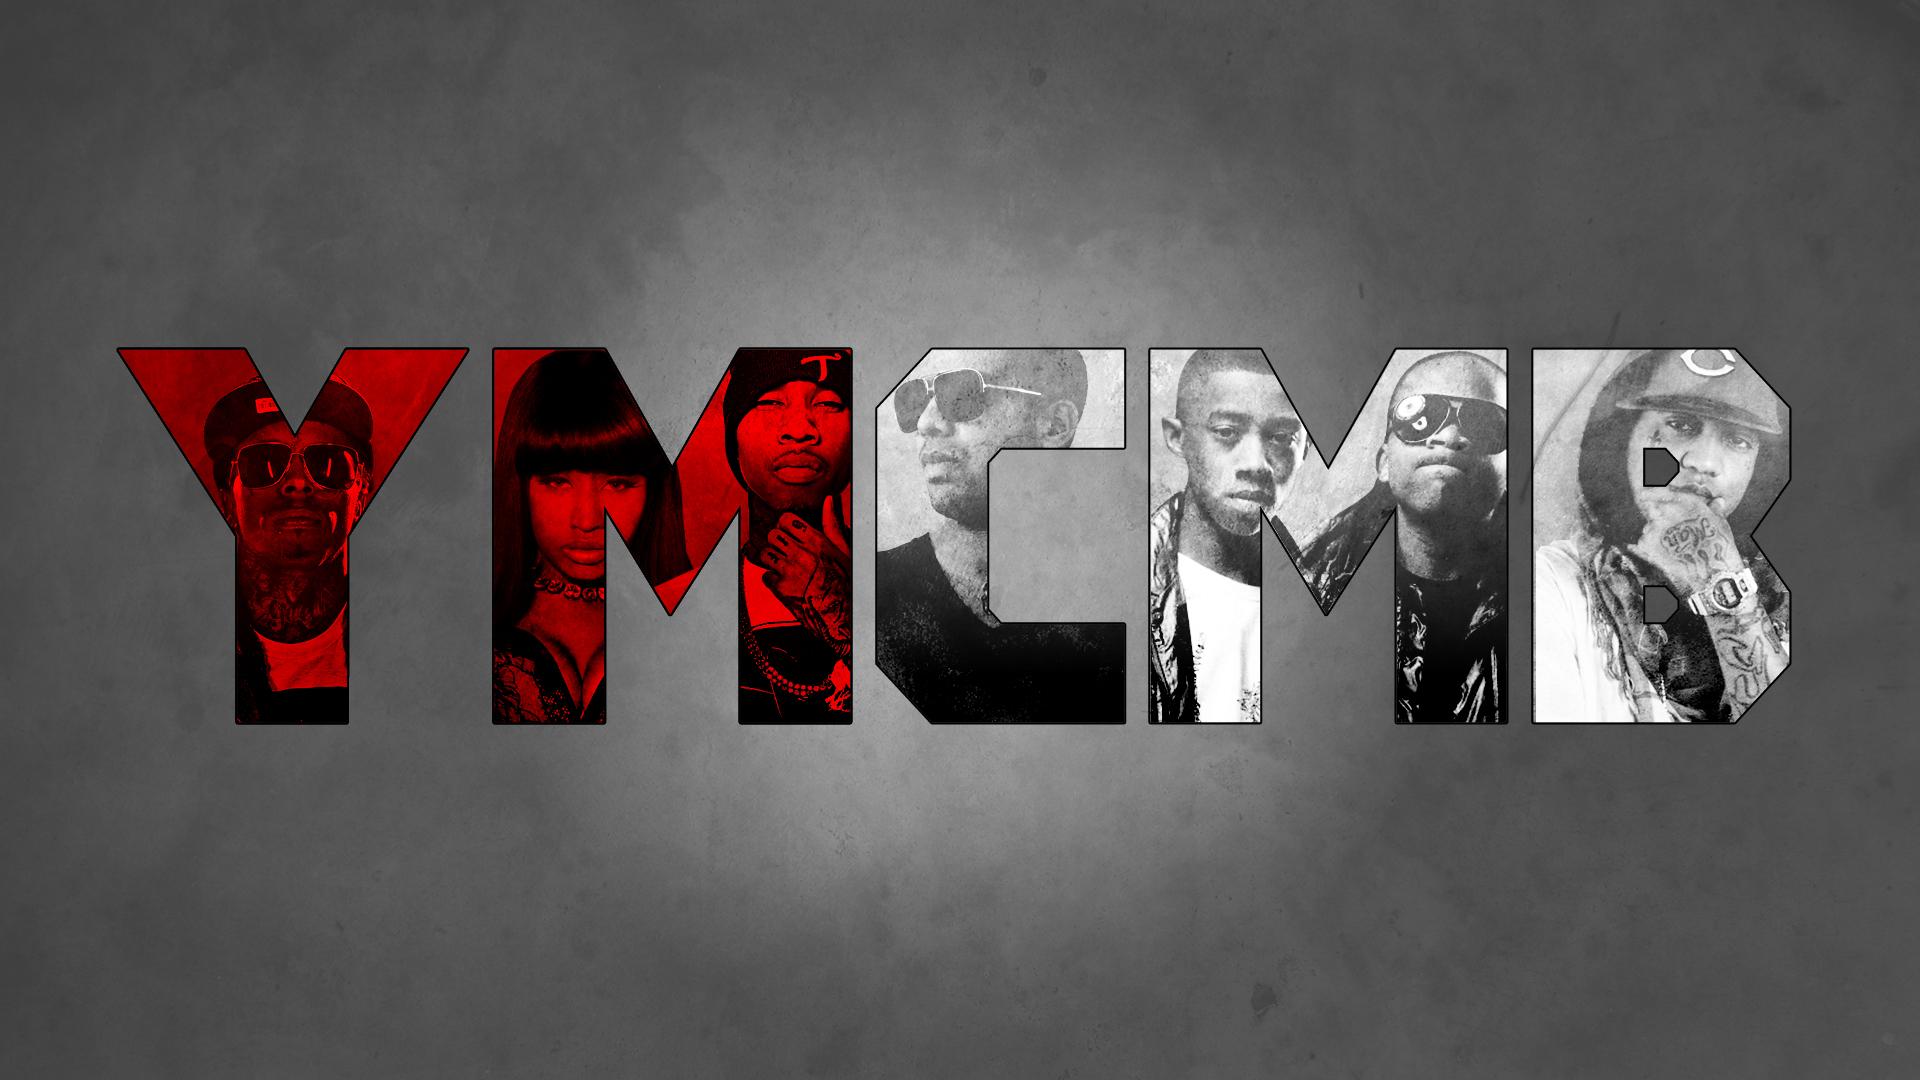 Ymcmb Members List 2013